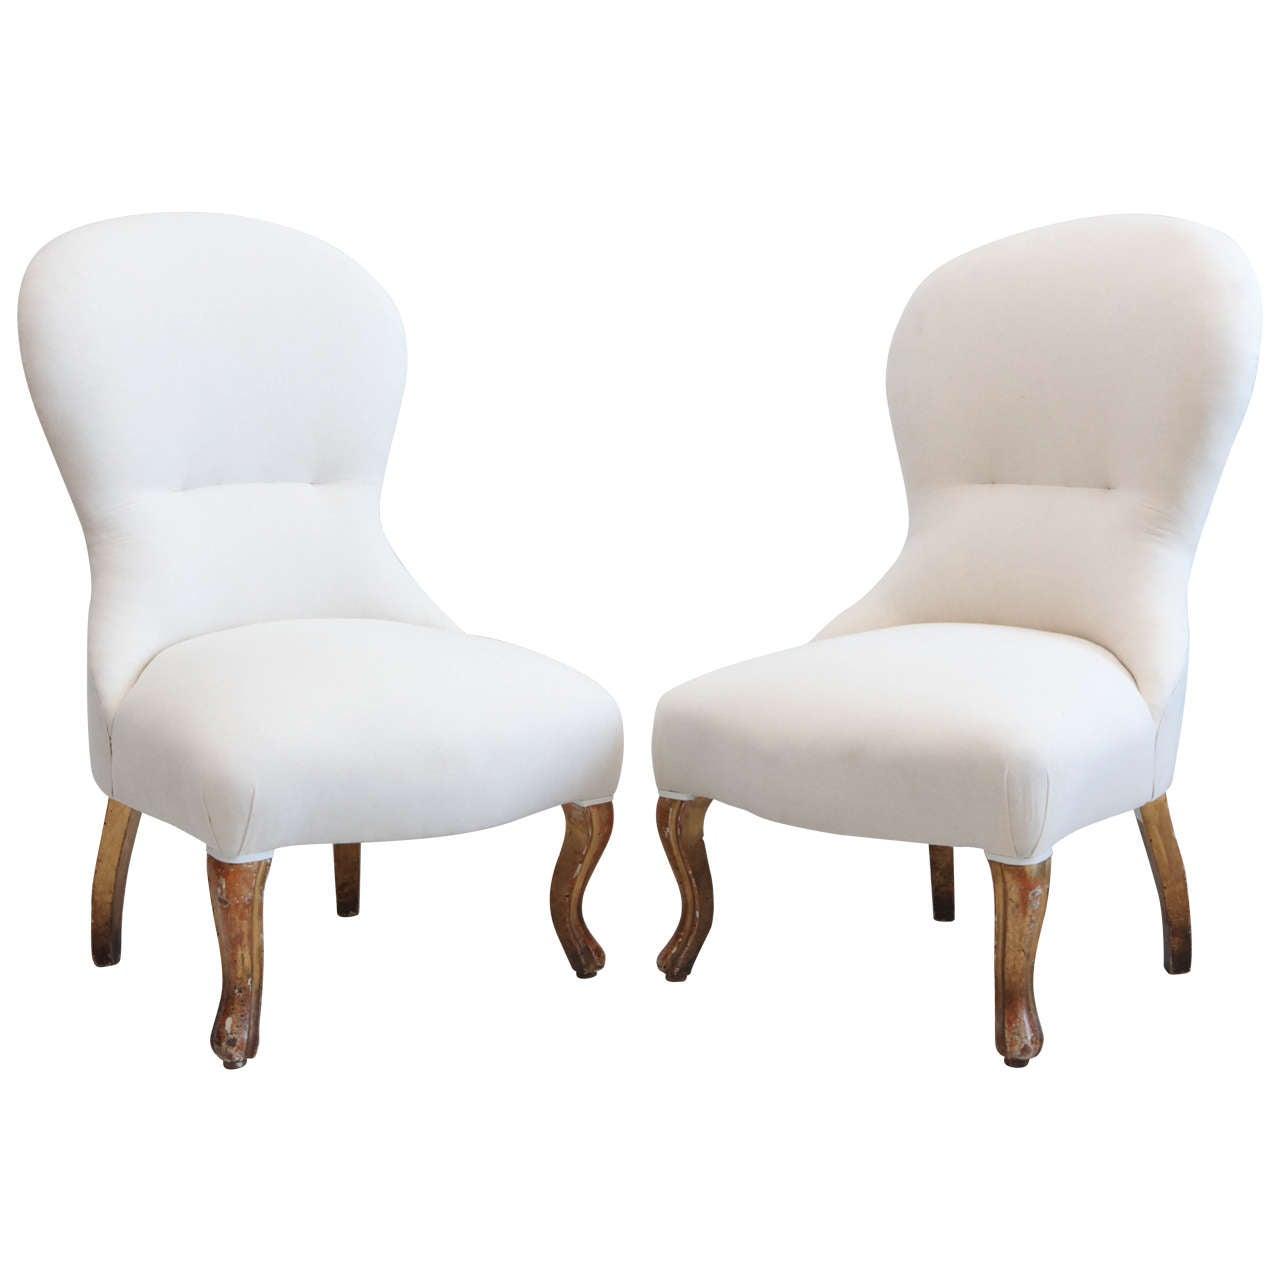 Vintage italian slipper chairs at 1stdibs